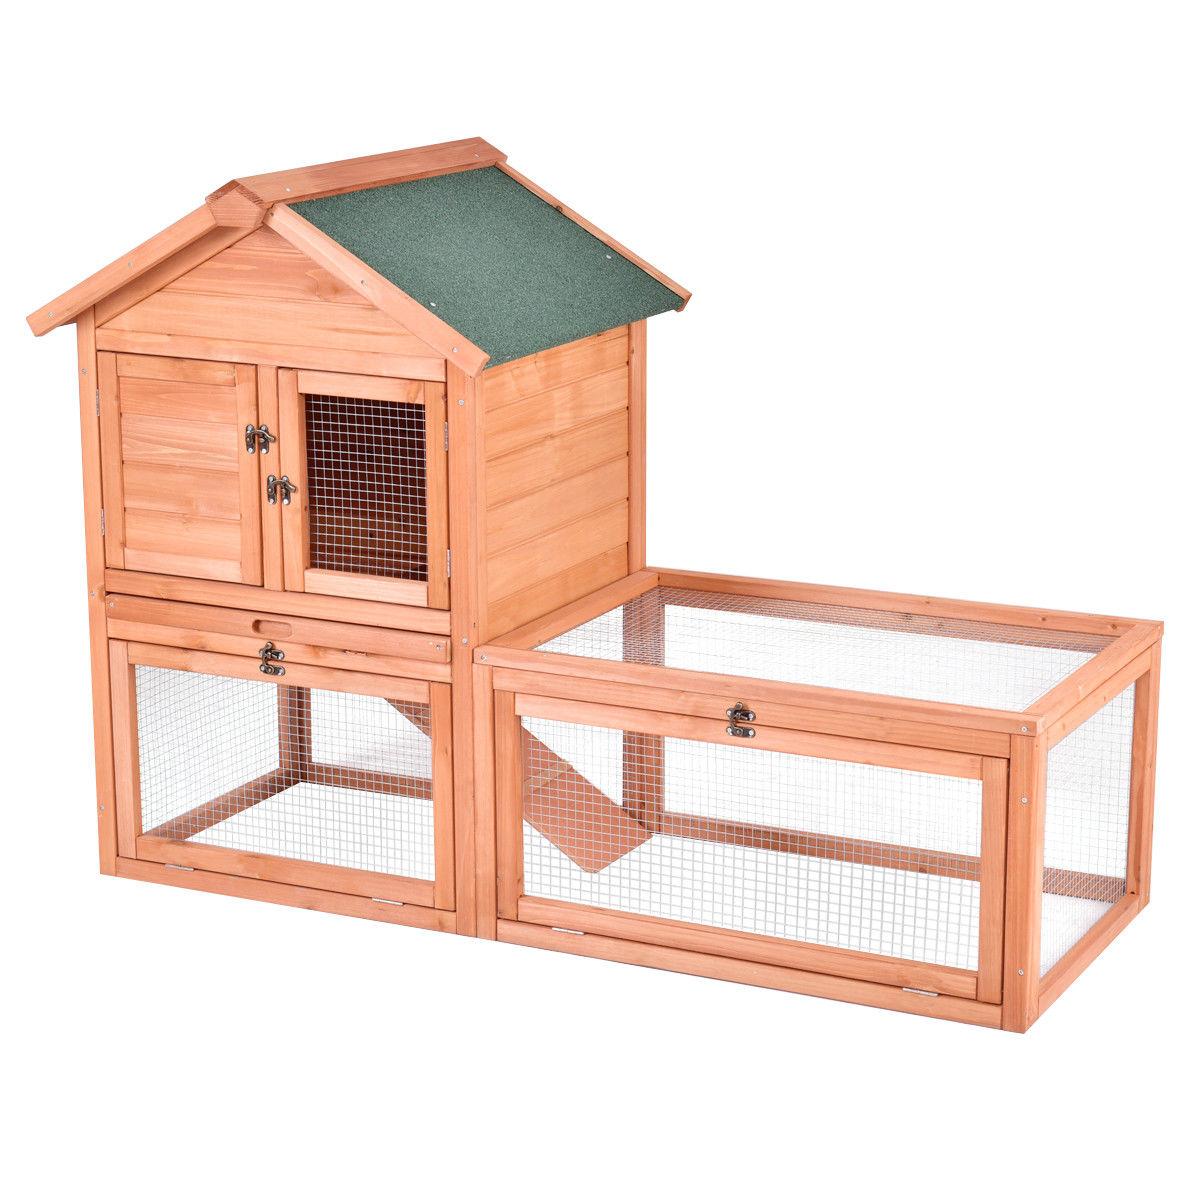 "Gymax Pet Supplies 56"" Wooden House Rabbit Hutch"